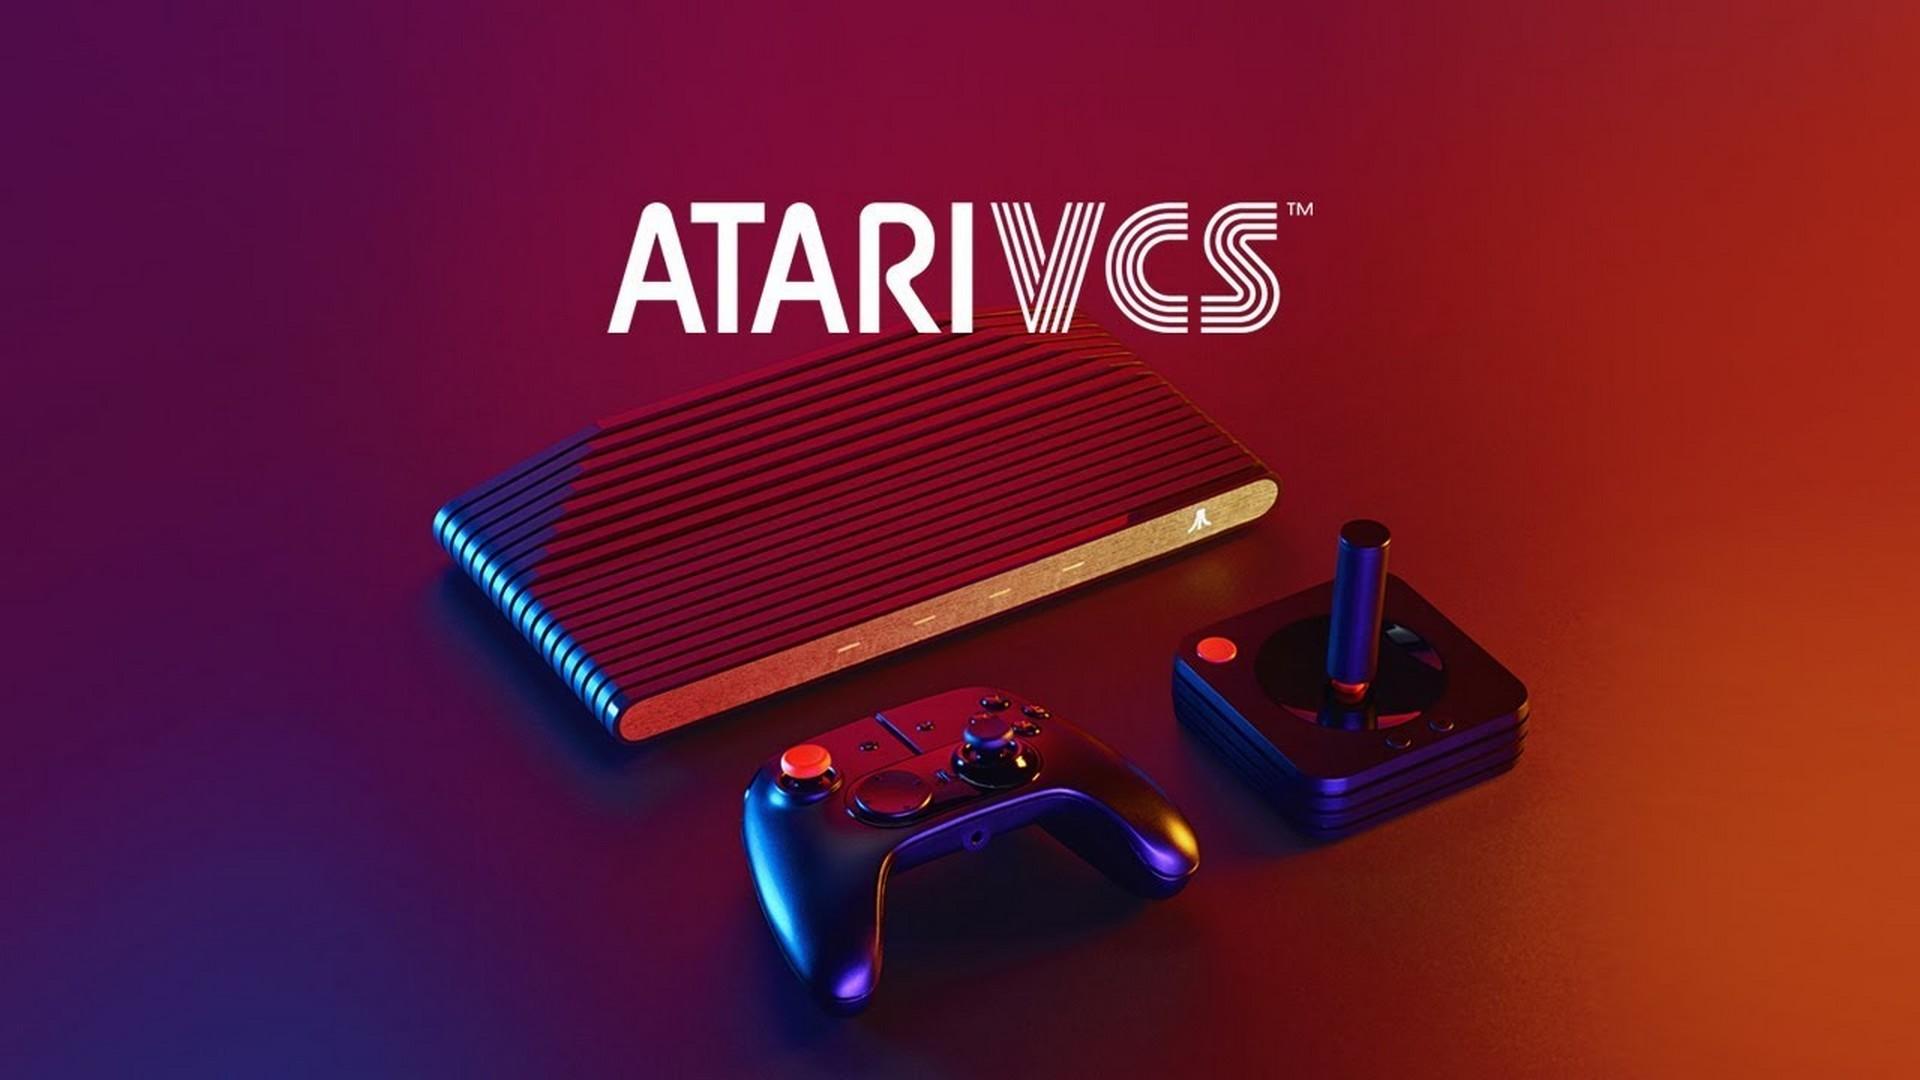 The Atari VCS Returns Down Under